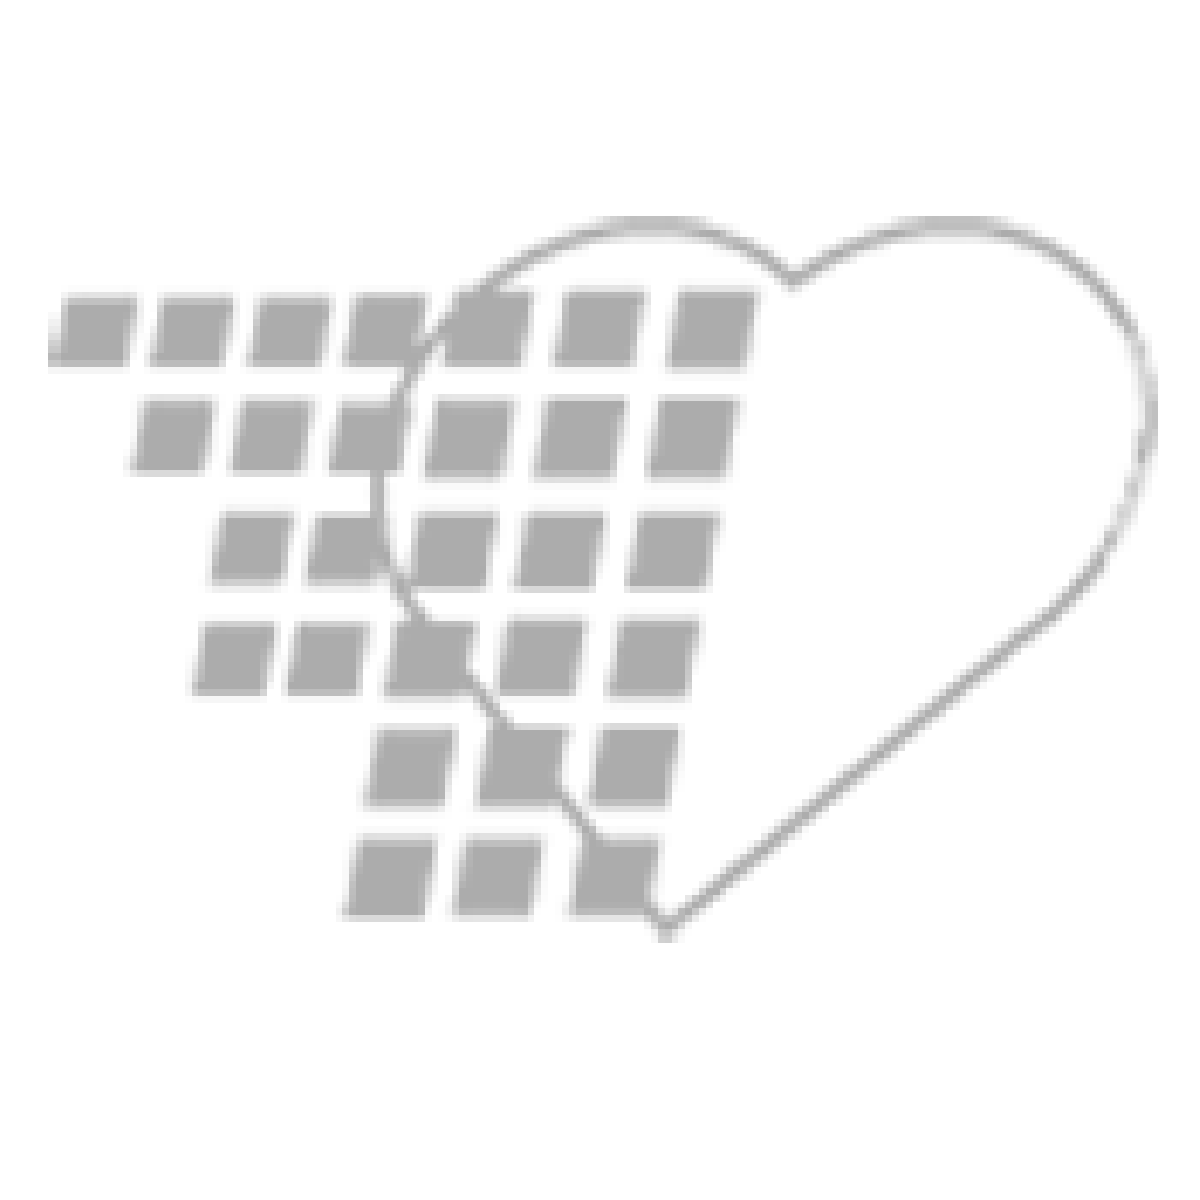 02-92-1005 Baseline® Plastic Goniometer 360° Degree Head